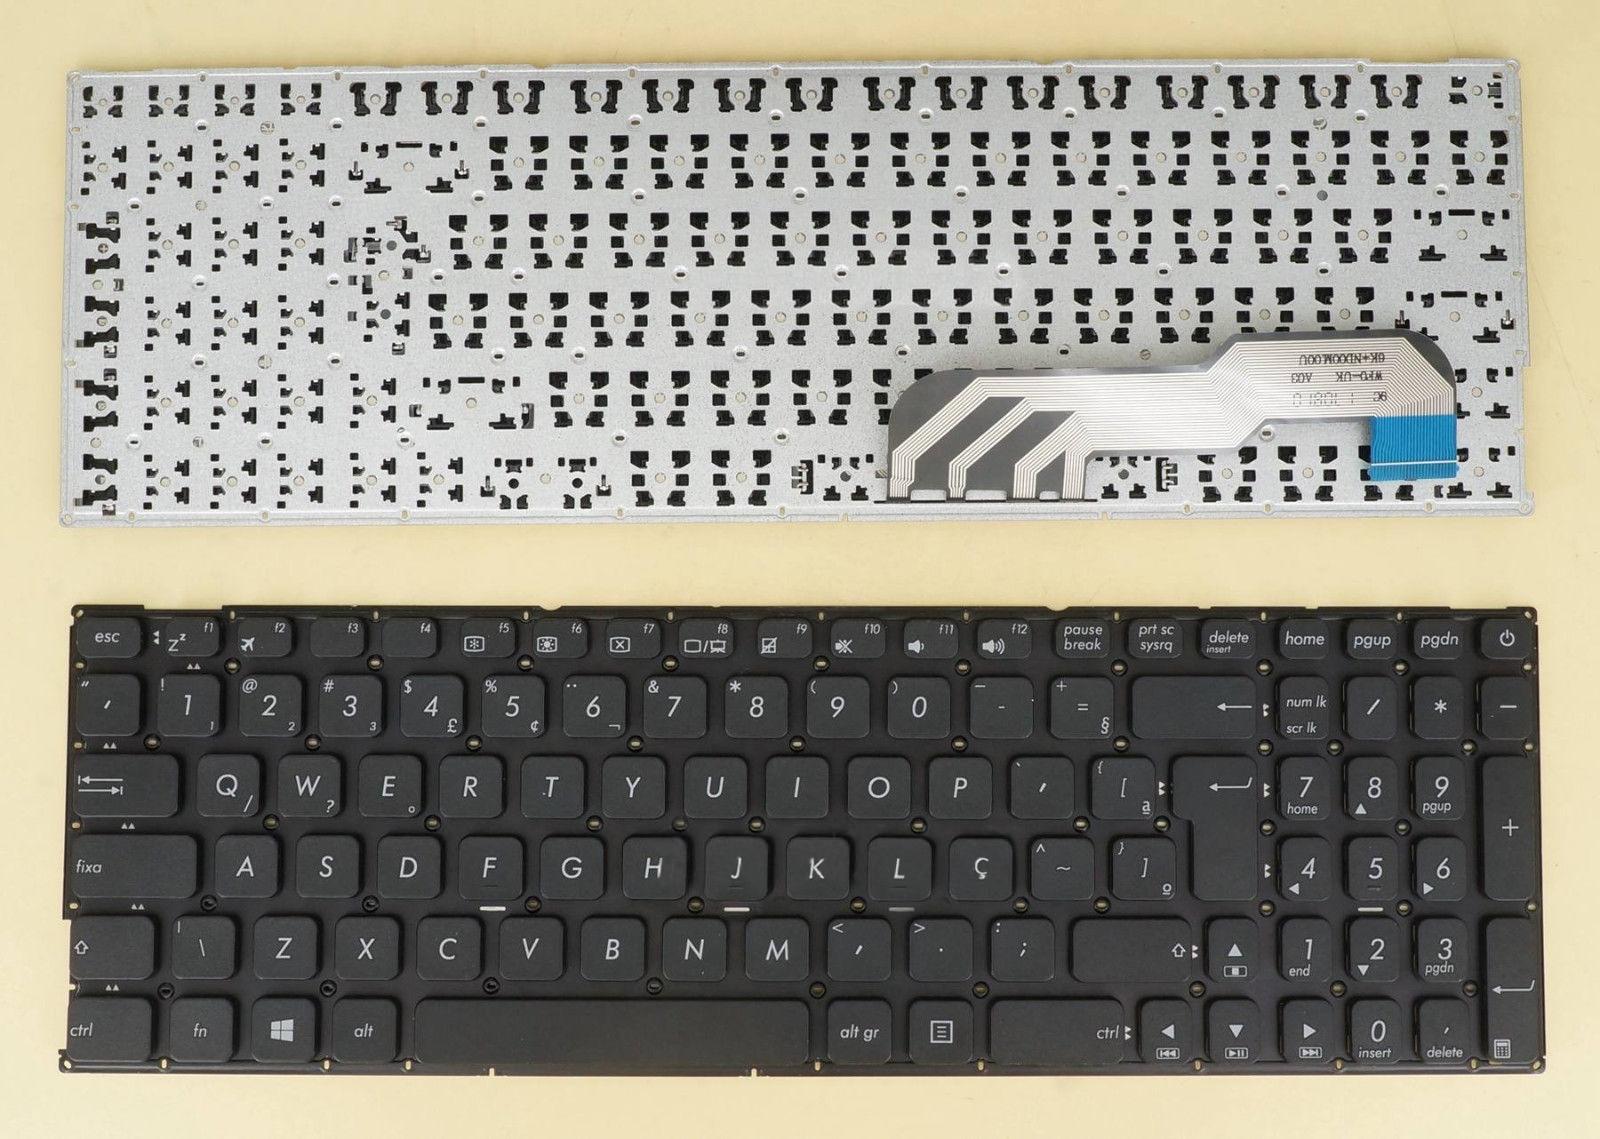 Brasil nuevo portugués teclado para ASUS X541U X541UA X541UAK X541UJ X541UV X541UVK X541N X541NA X541NC X541S X541SA X541 negro